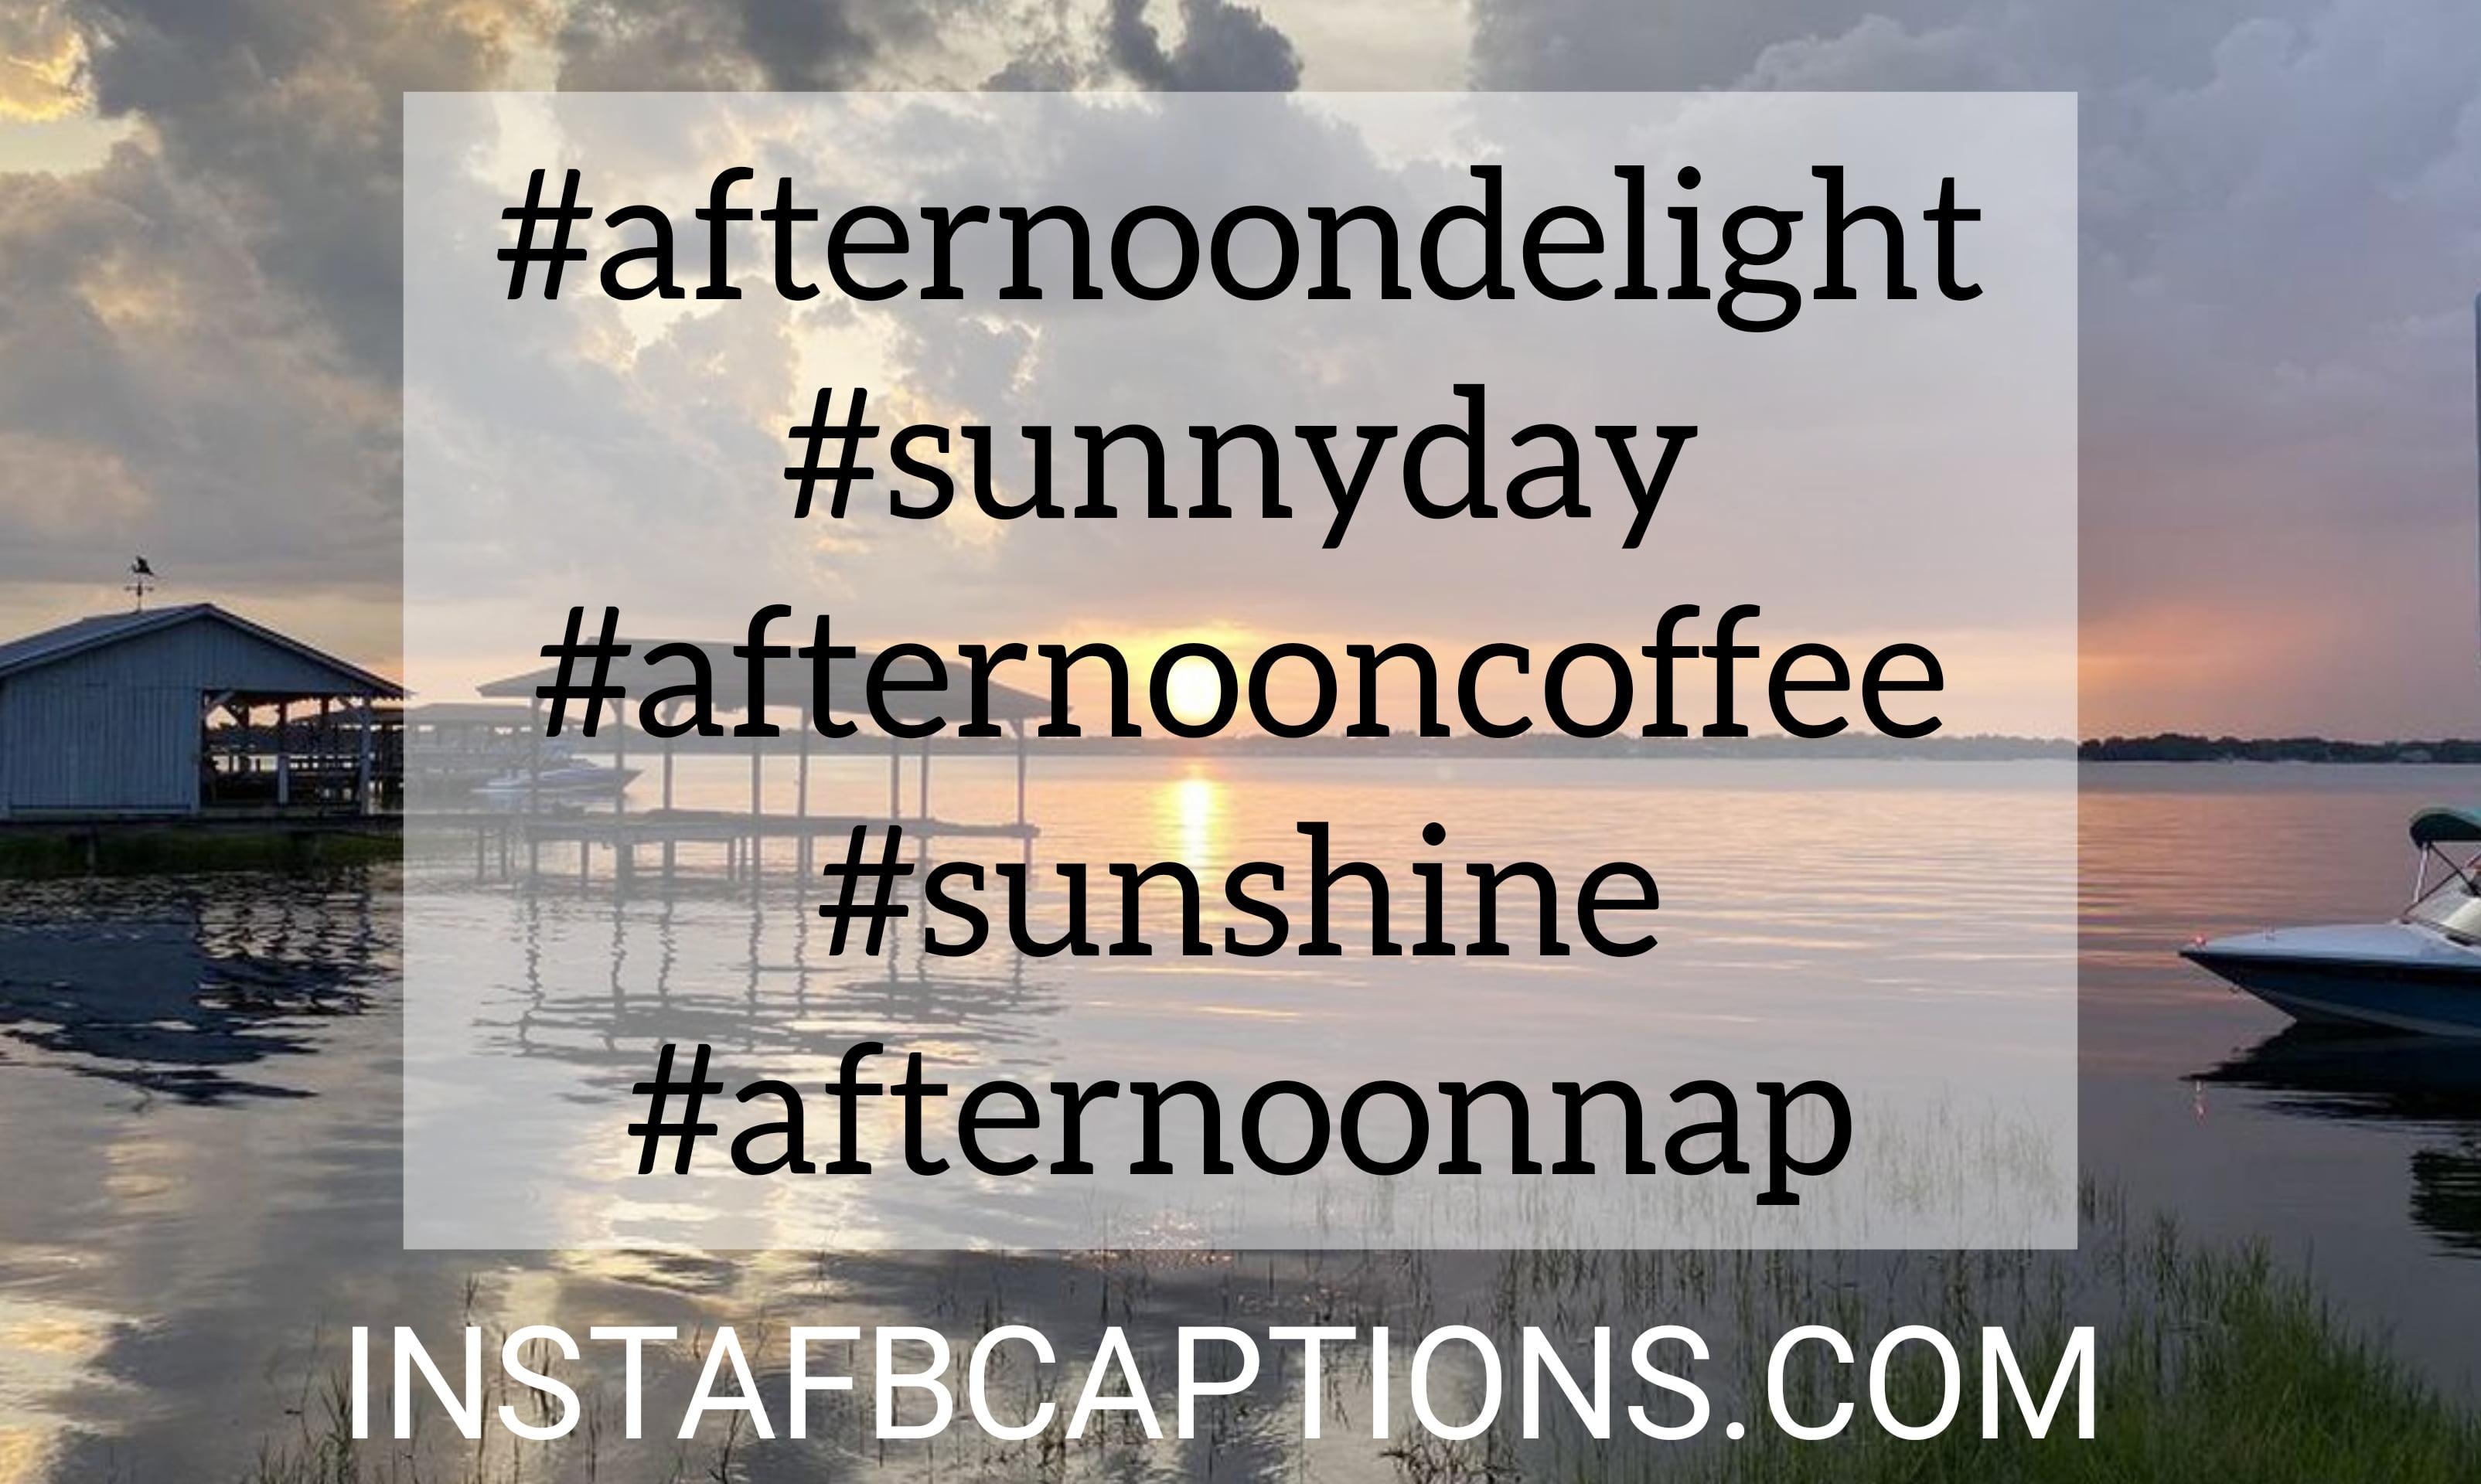 Afternoon Hashtags  - Afternoon hashtags - 50+ GOOD AFTERNOON Instagram Captions 2021